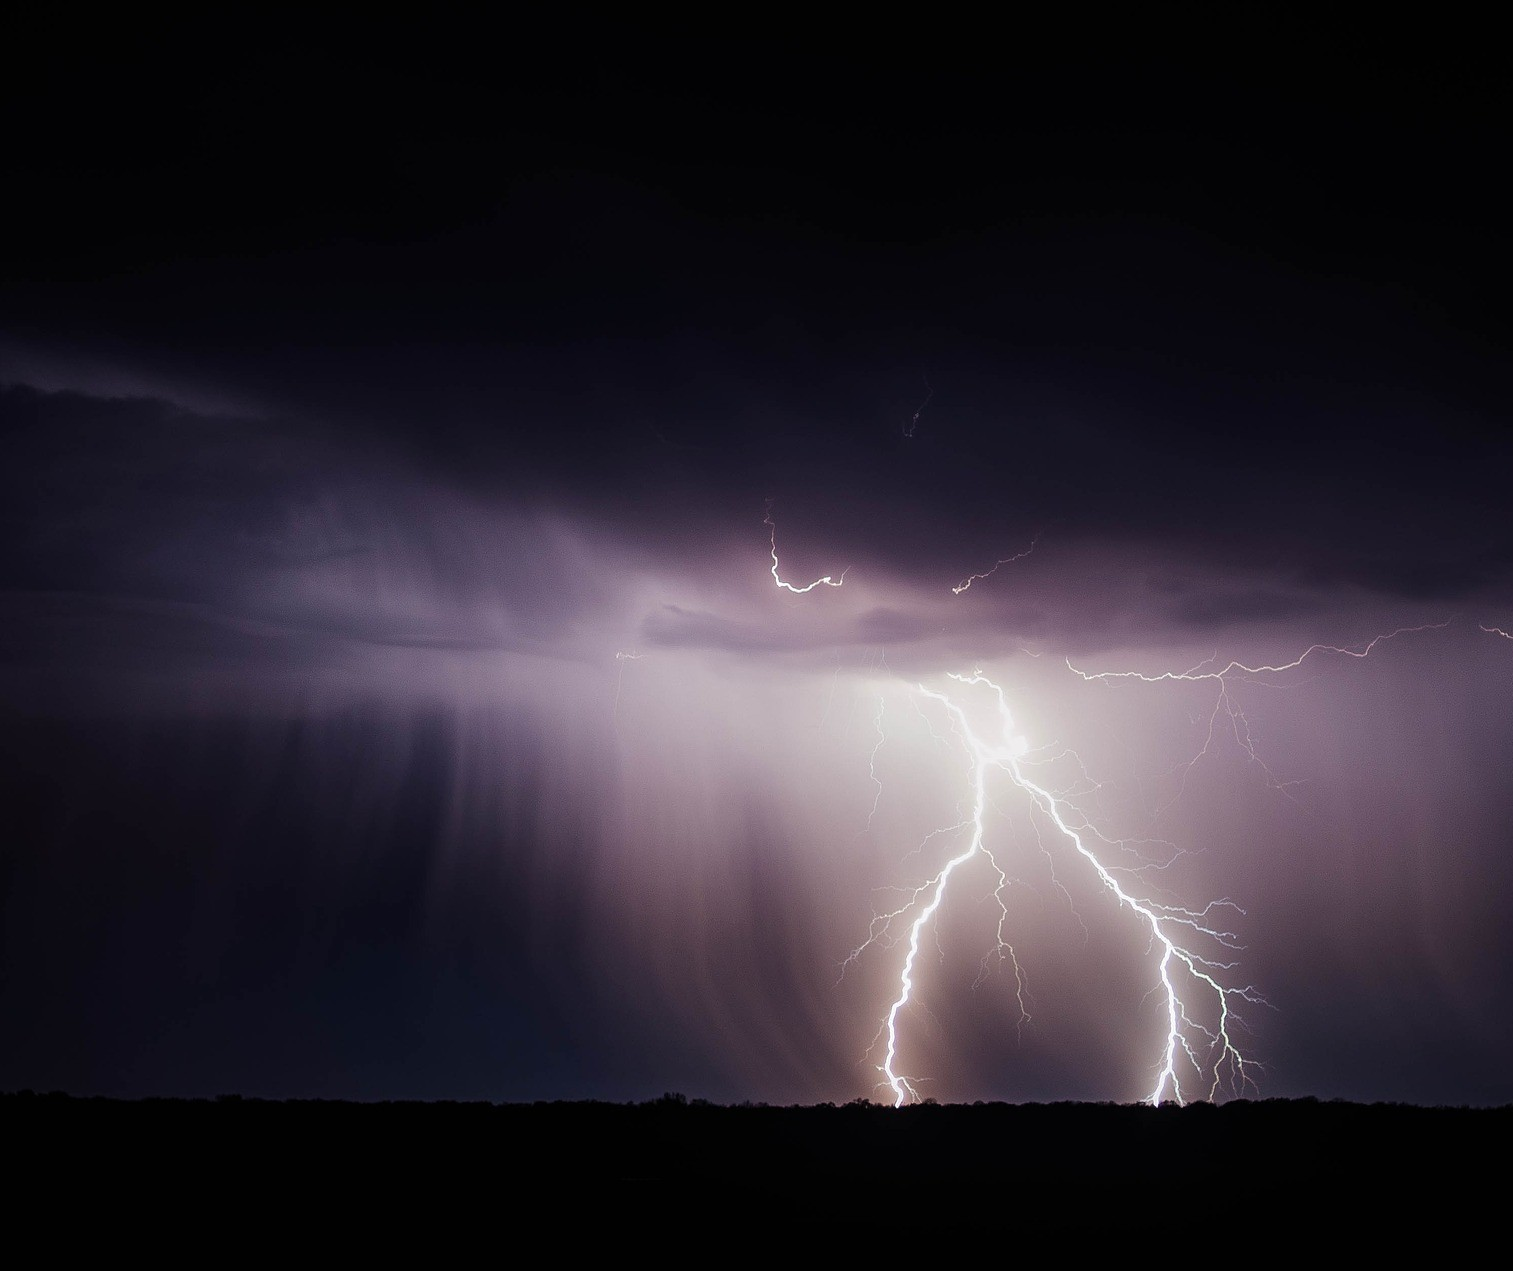 Alerta laranja: Novo temporal está previsto para Maringá